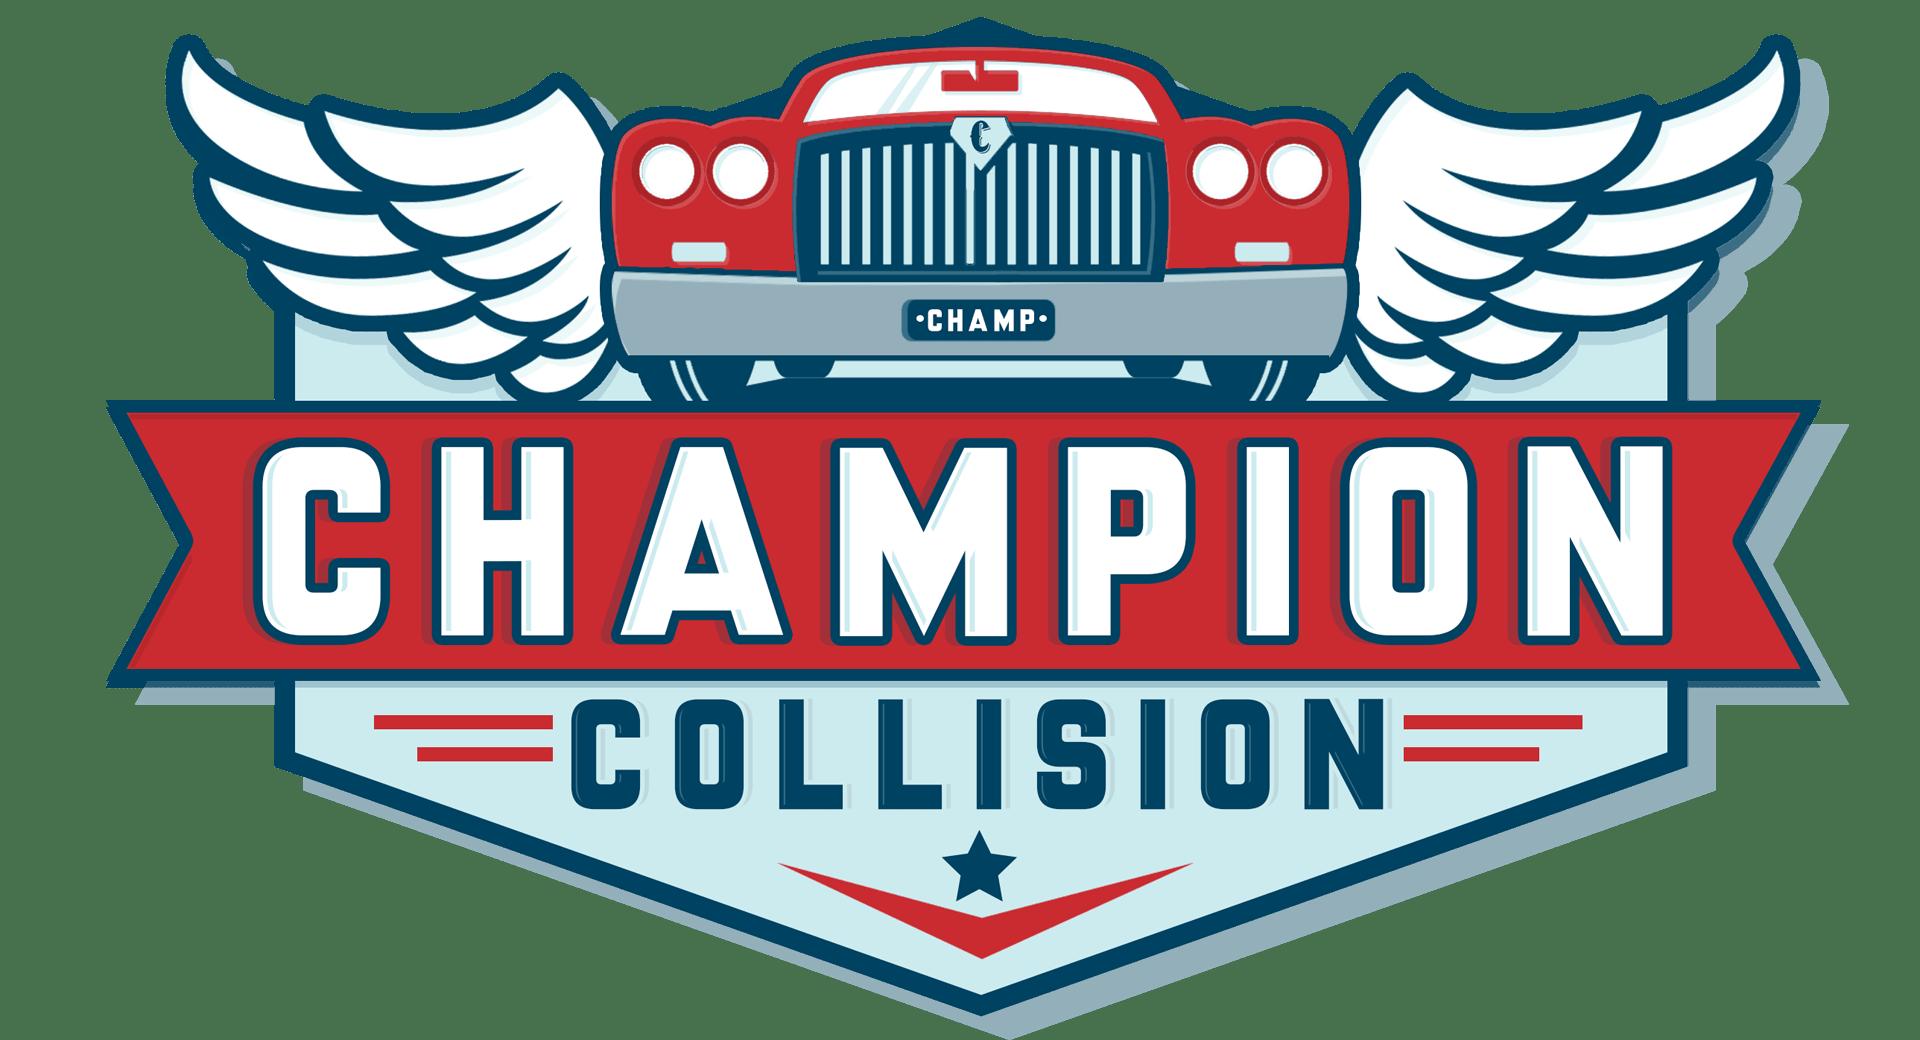 Champion Collision - Sugar Rock - Logo | Branding ...